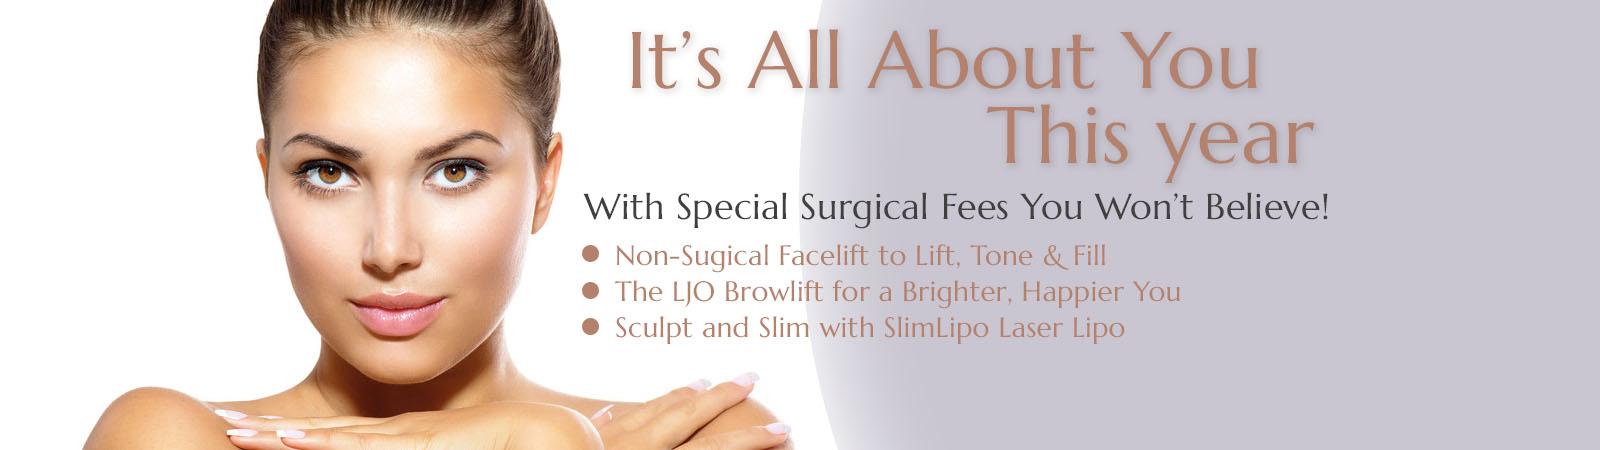 January - February Plastic Surgery Specials